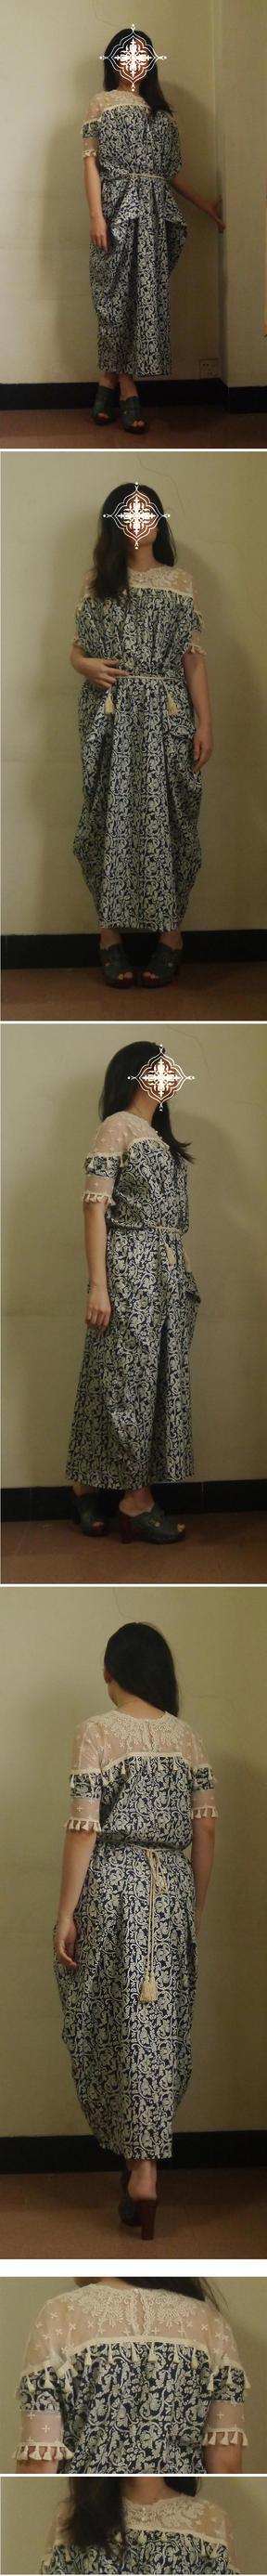 classic rome skirt by ASingleGiraffe